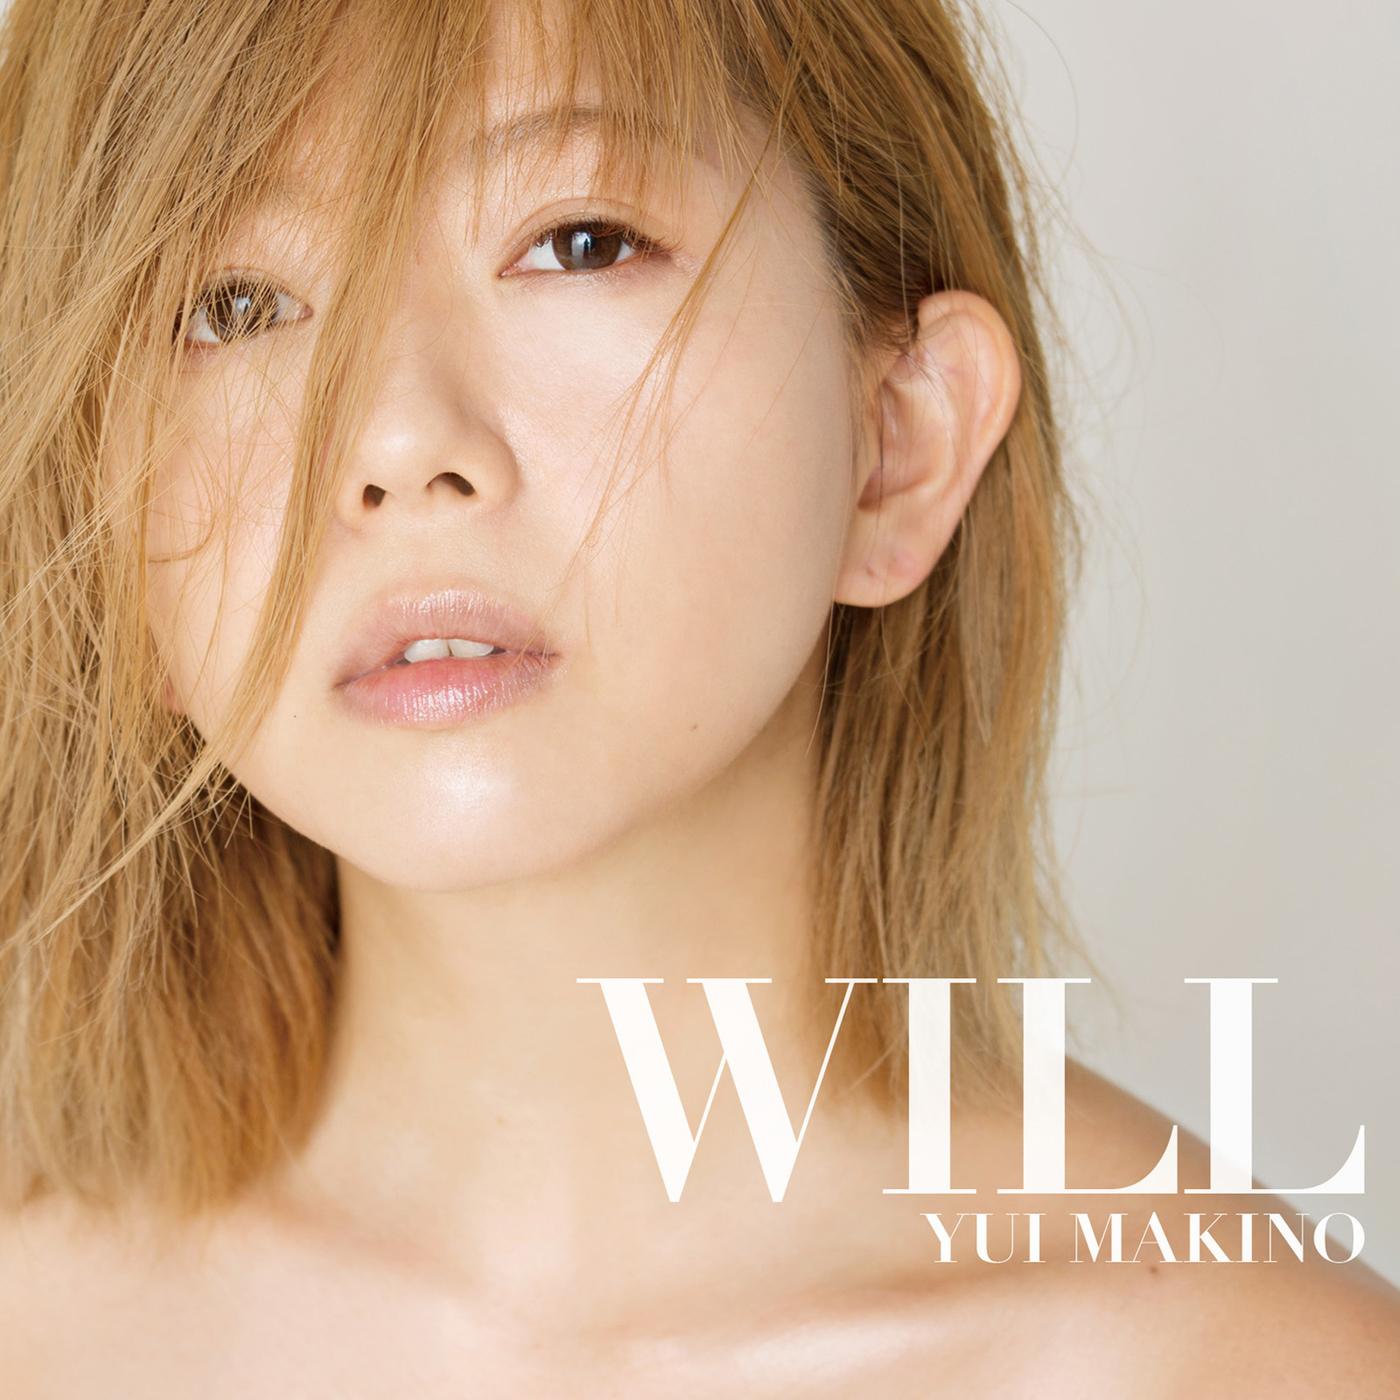 20180328.1700.10 Yui Makino - WILL cover.jpg